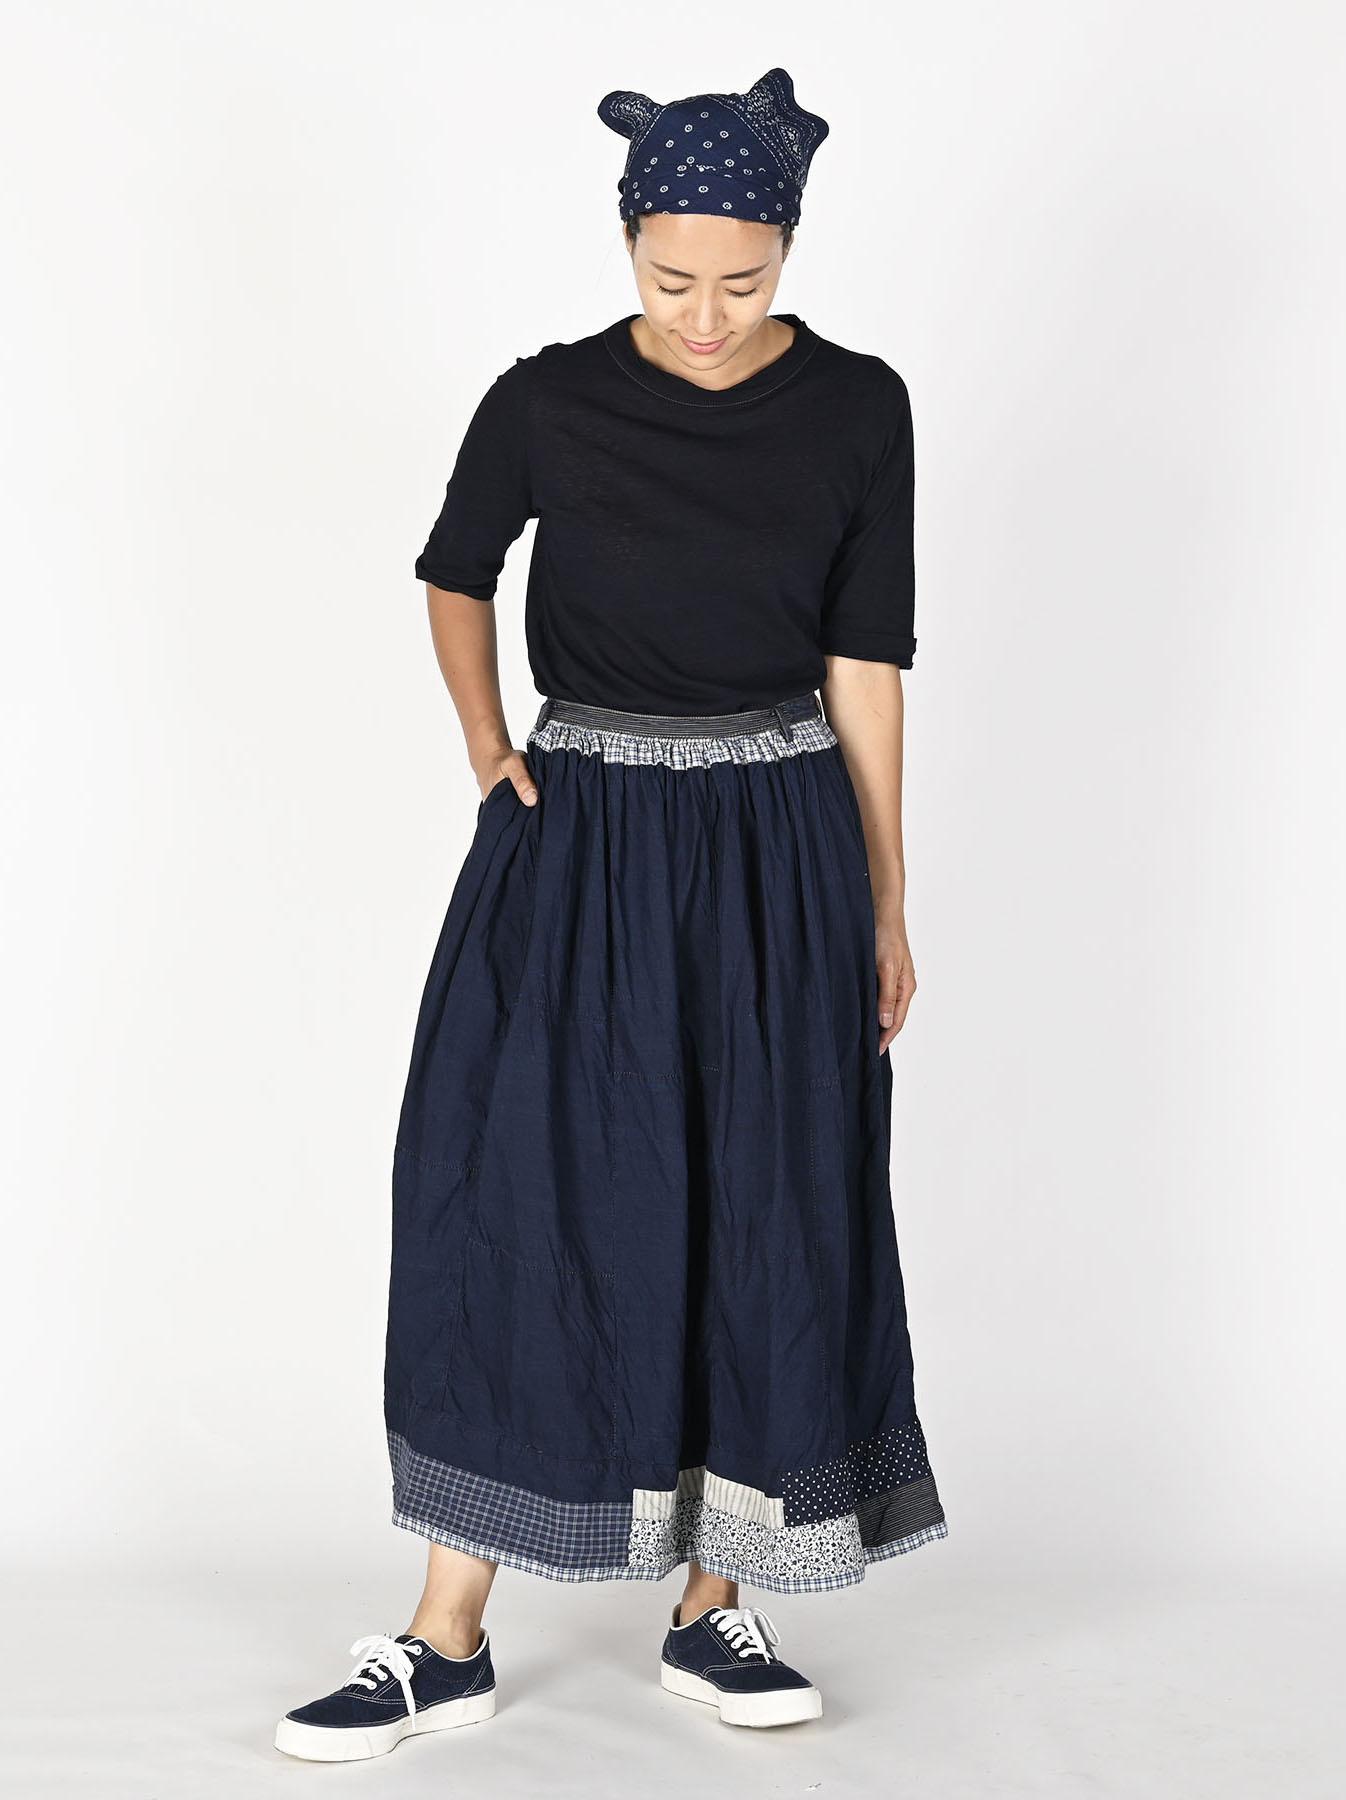 Indigo Tappet Patchwork Skirt-2